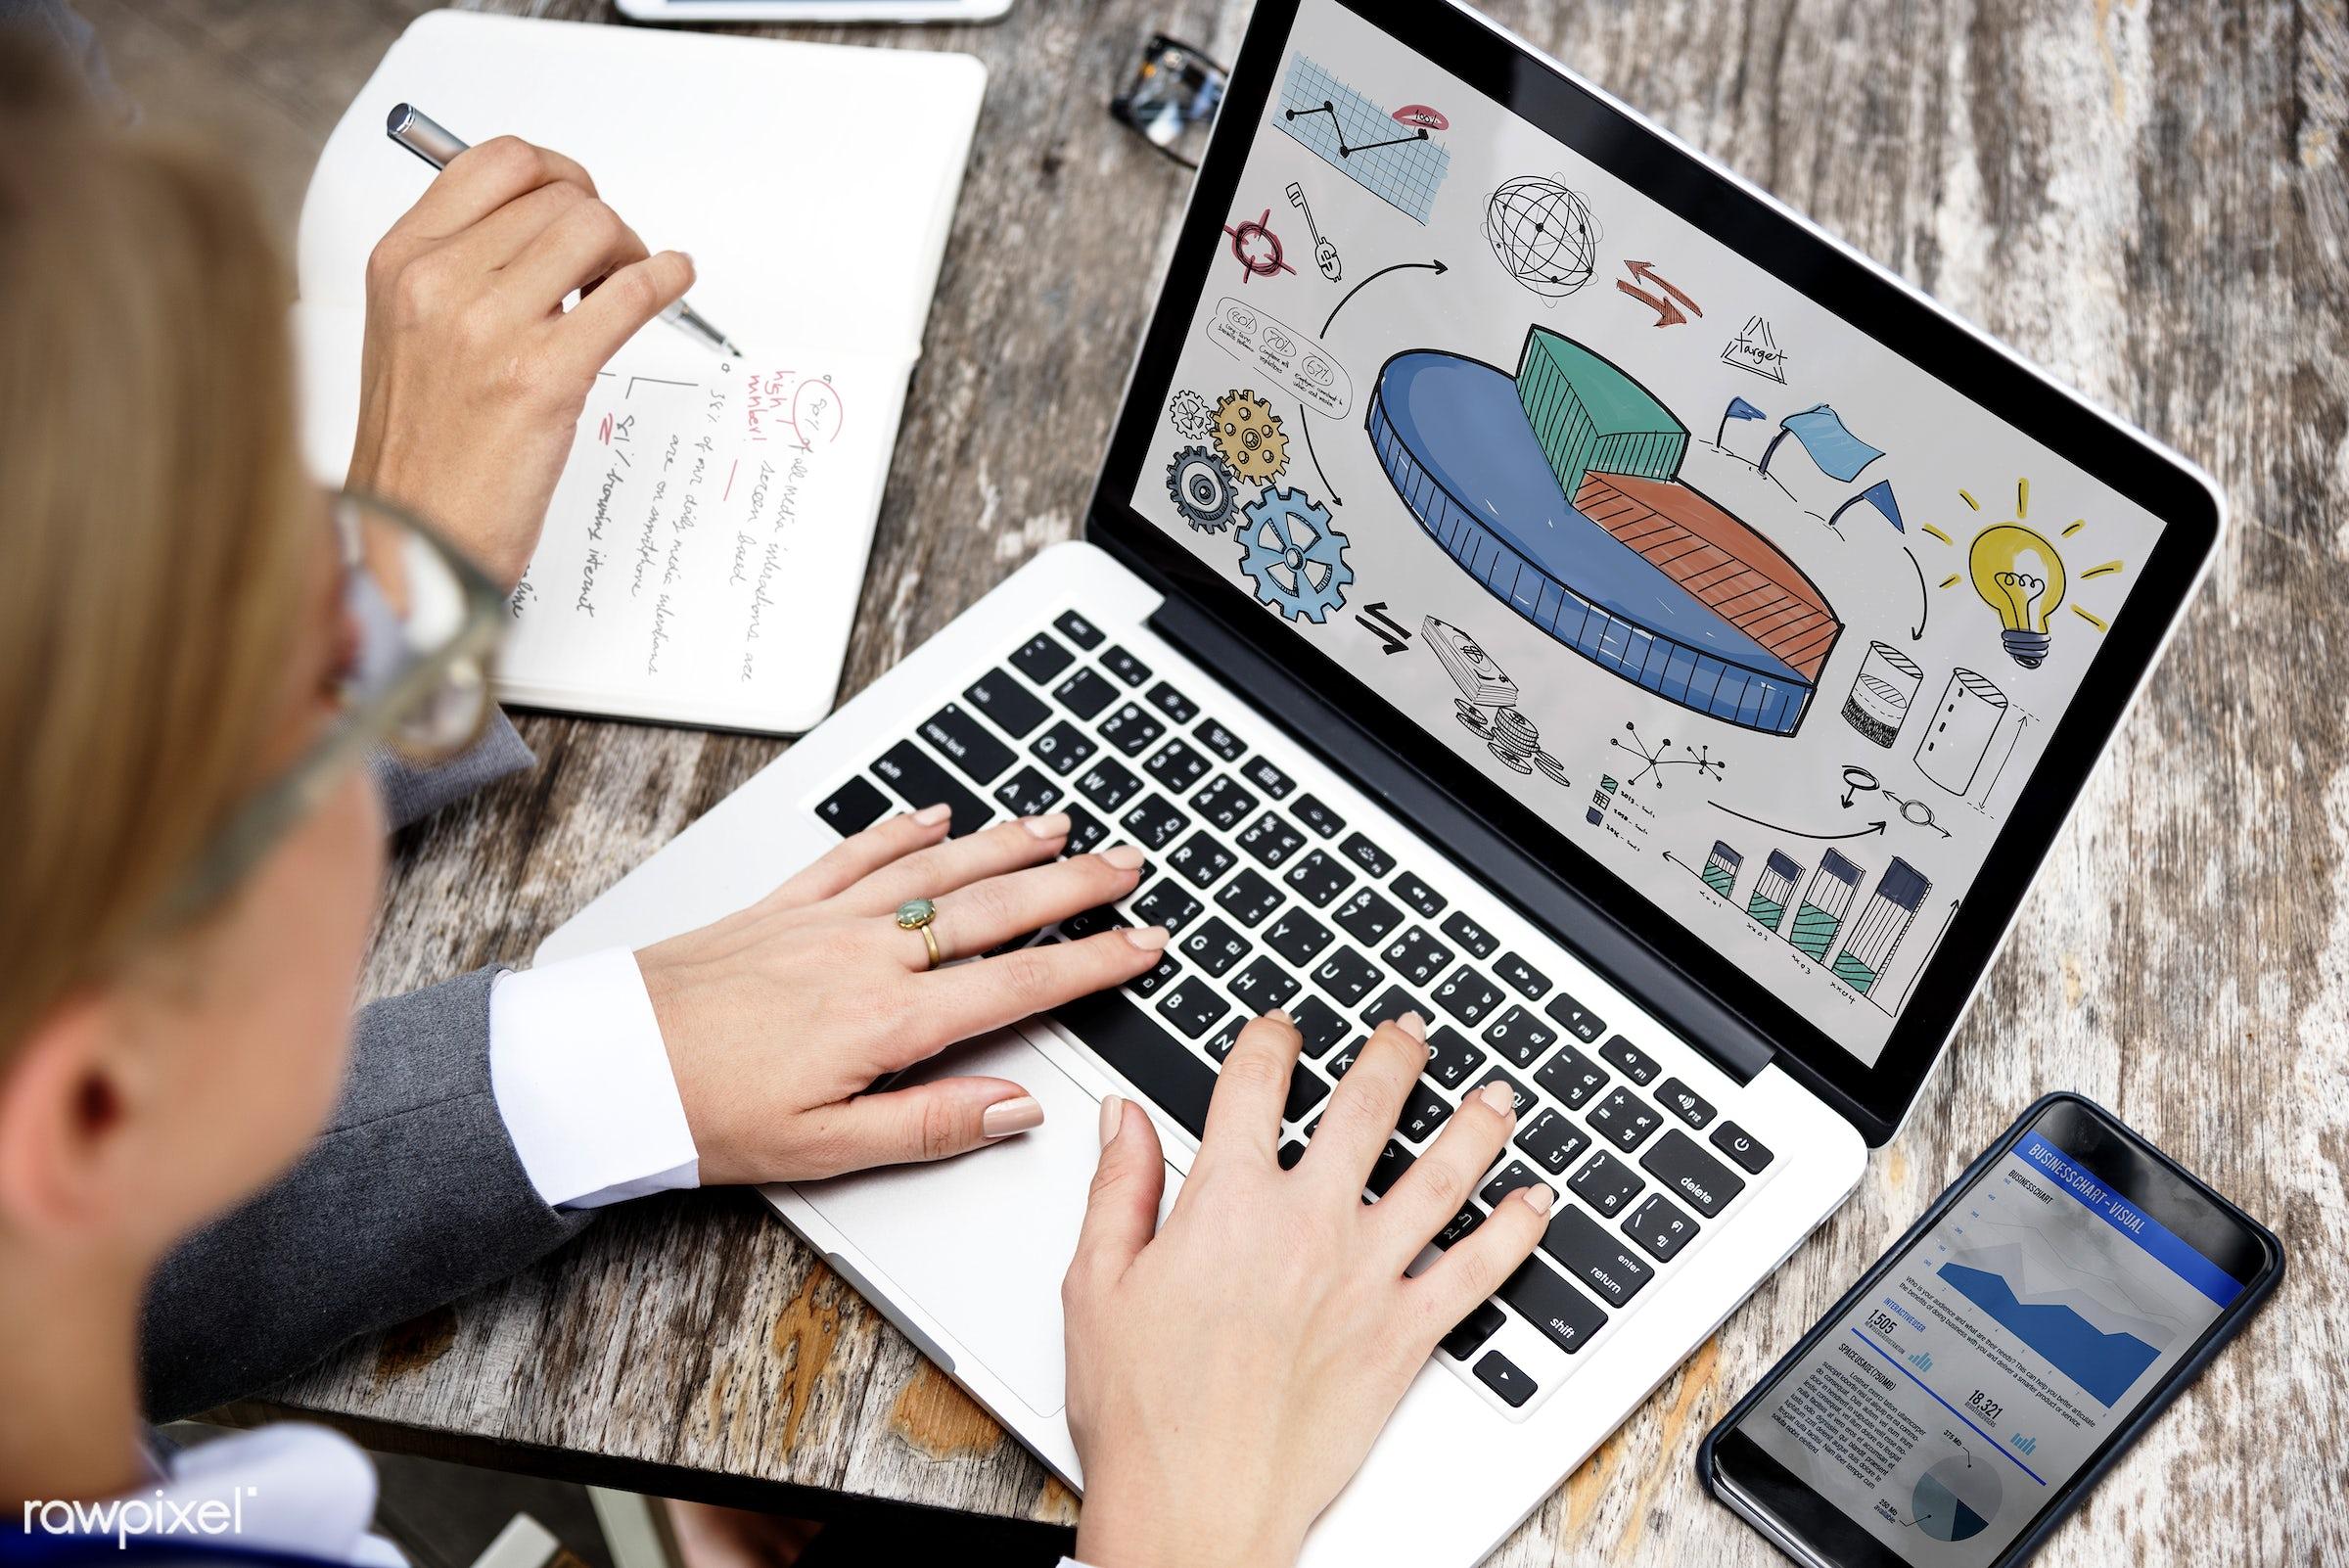 business, businesswoman, businesswomen, commercial, company, corporate, corporation, development, devices, digital, digital...